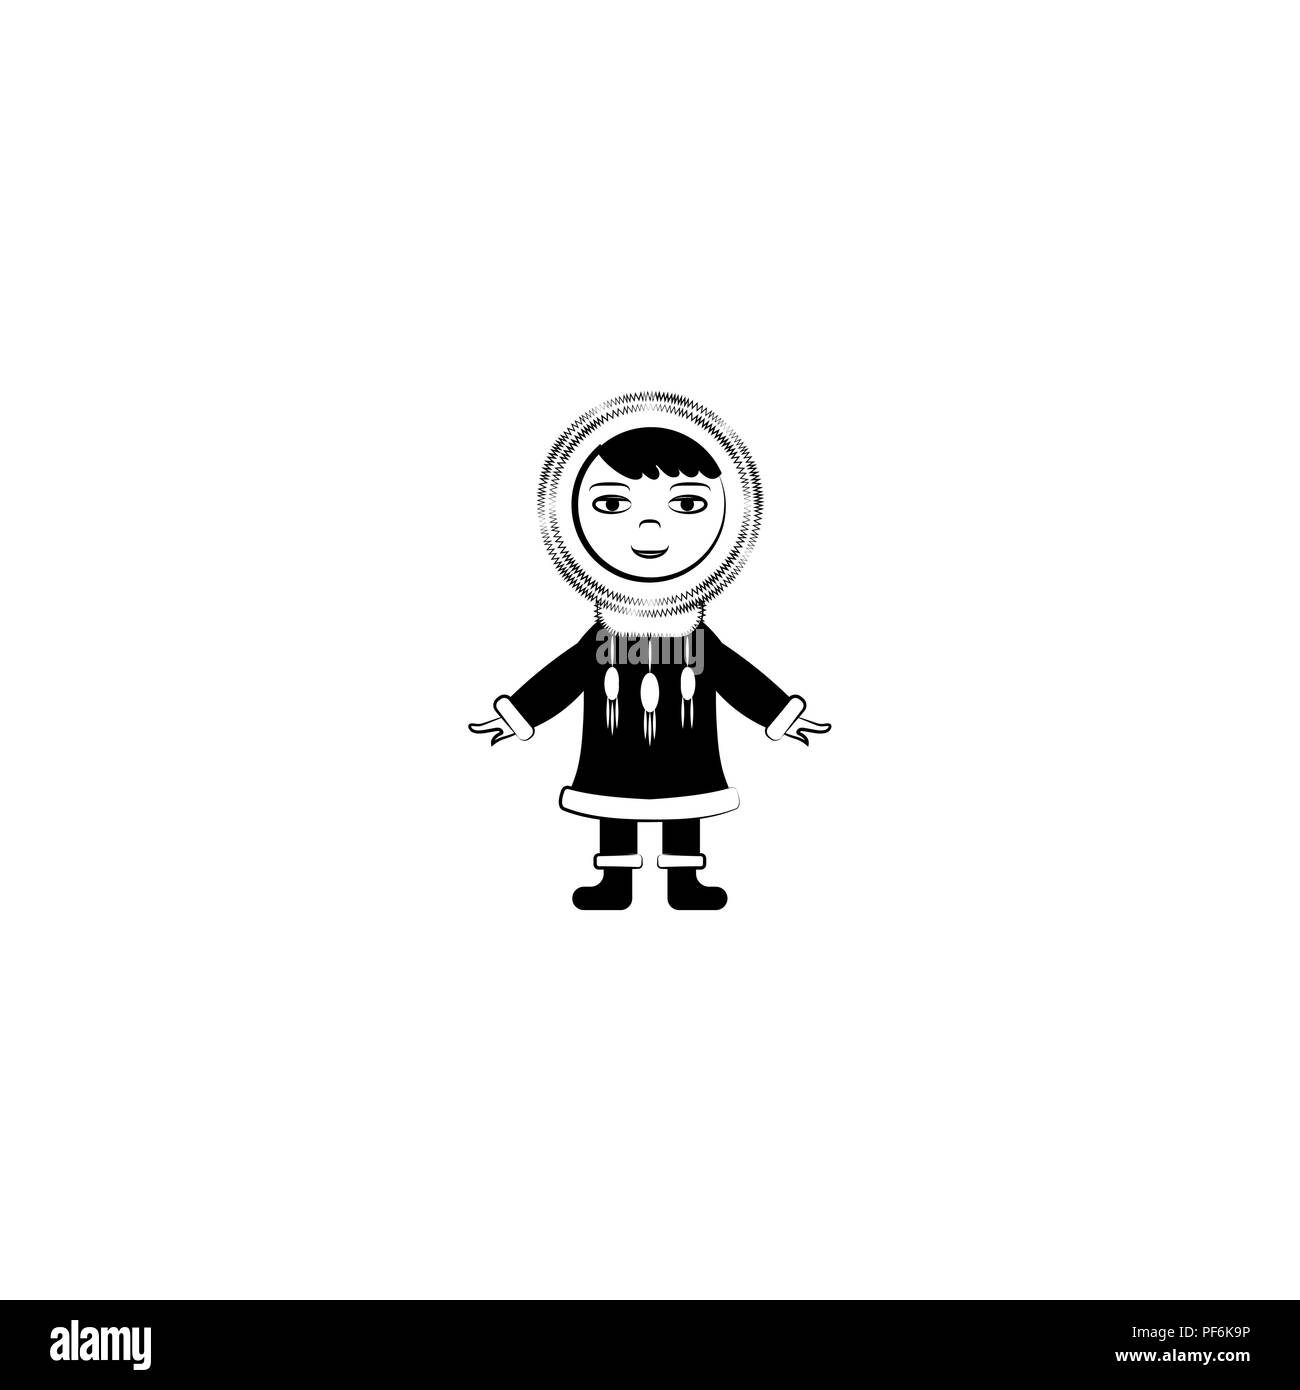 Eskimo vector icon black on white background Stock Vector